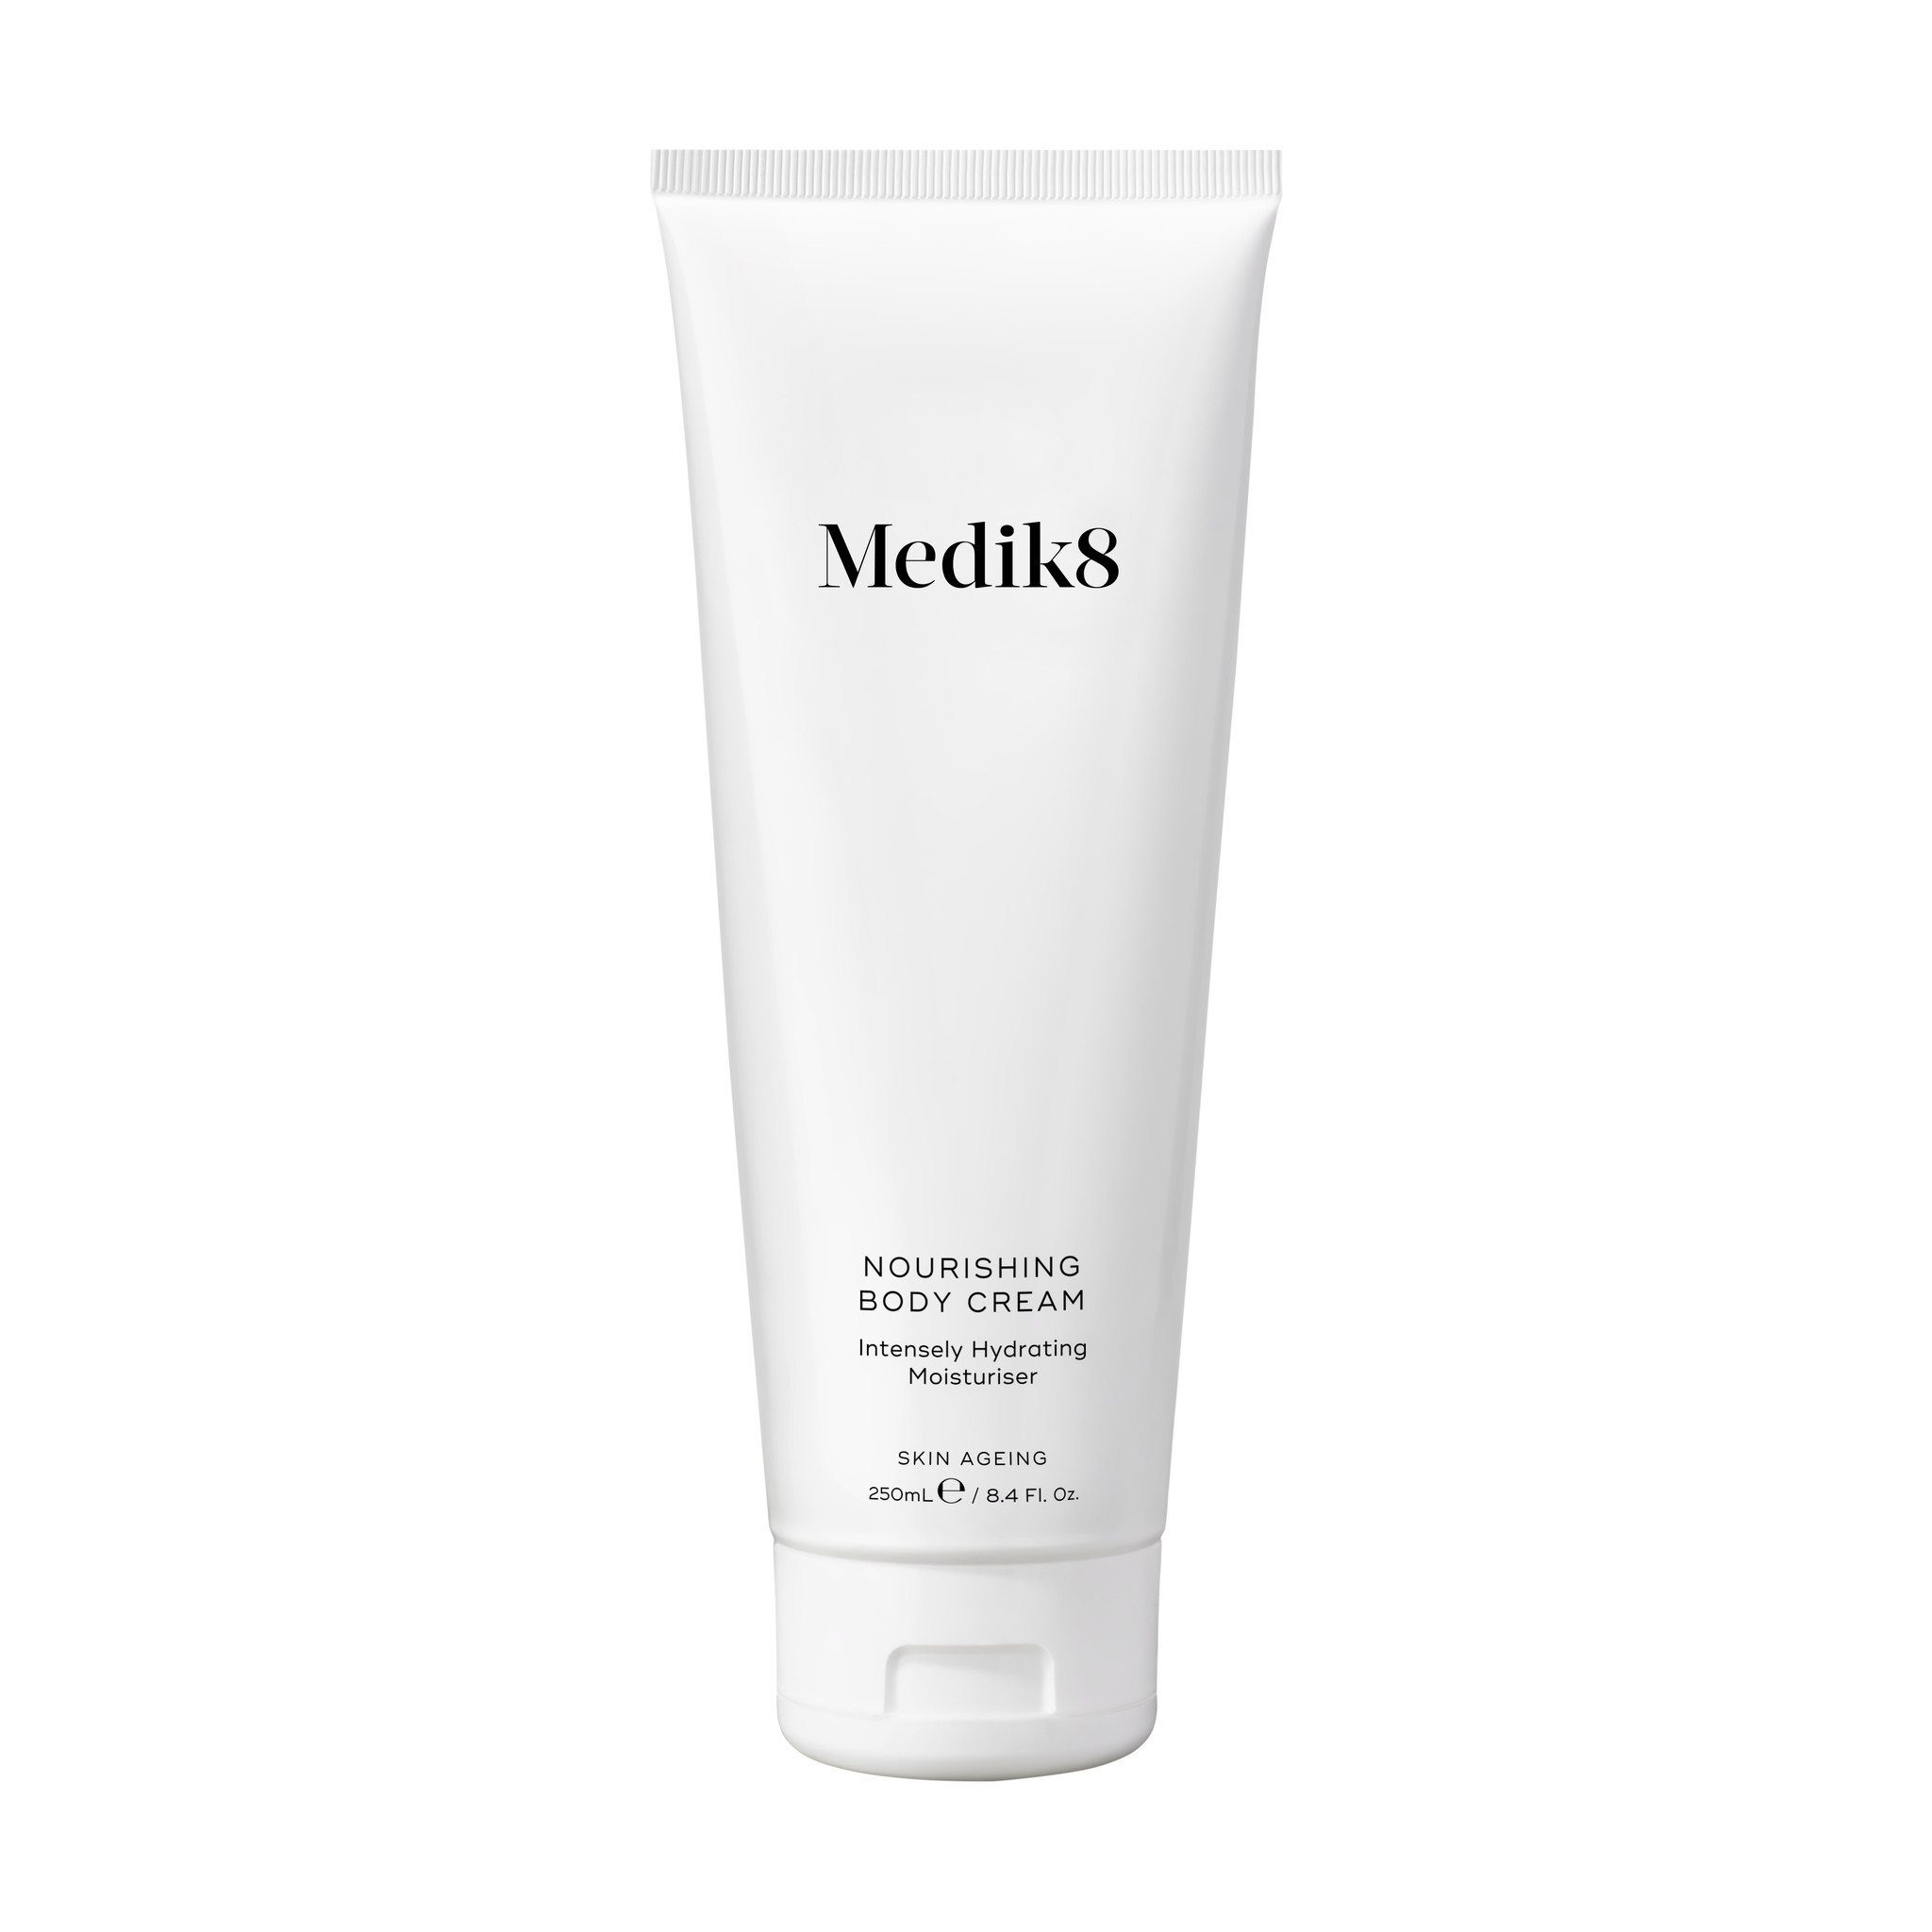 Medik8 Nourishing Body Cream | Intensely Hydrating Moisturiser | 250ml